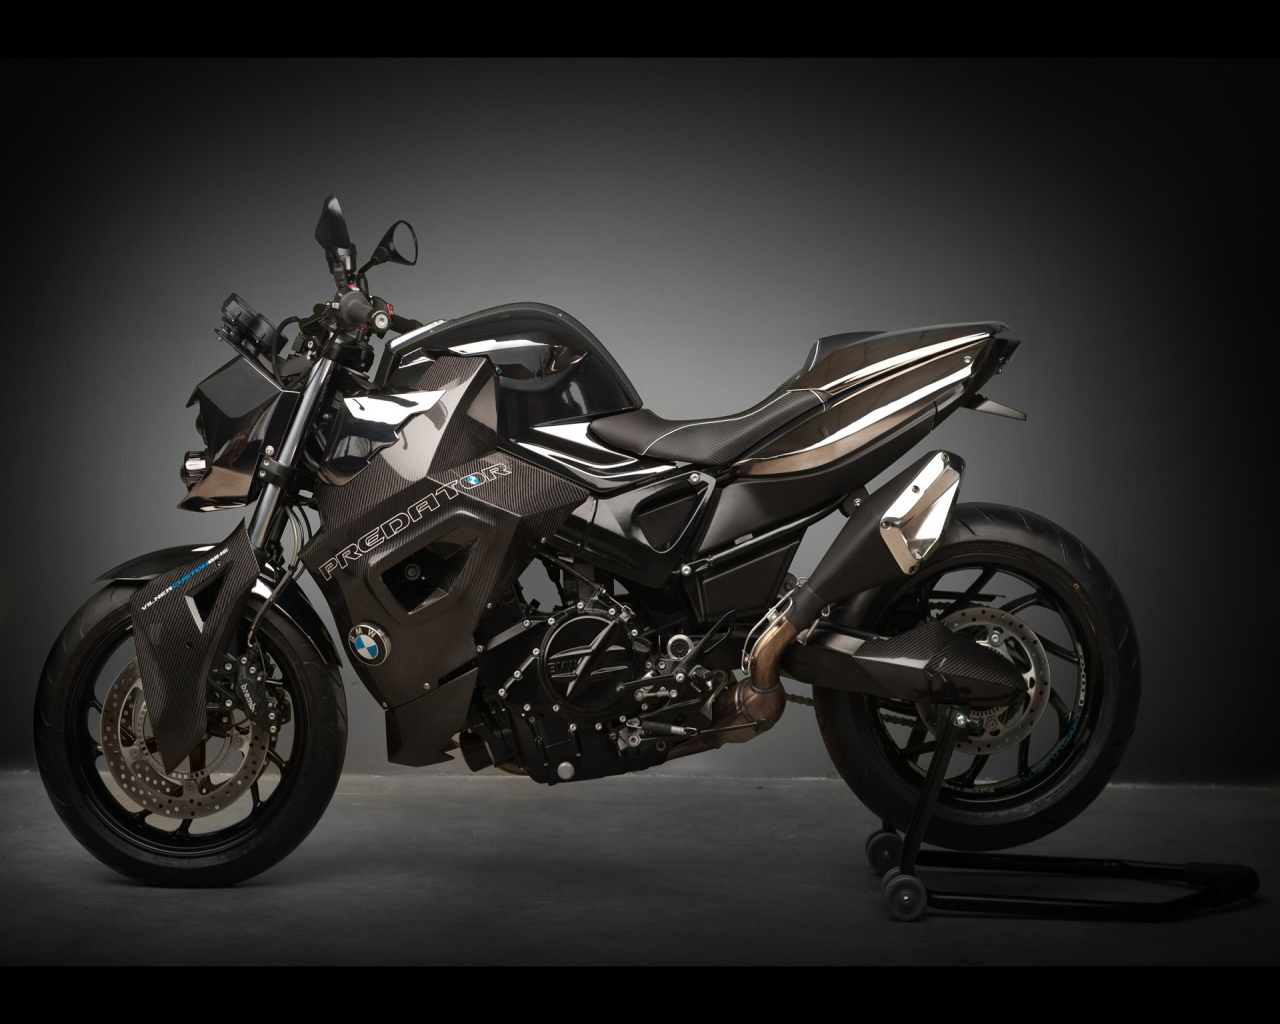 custom bike bmw f800 r predator static gray background wallpapers 1280x1024